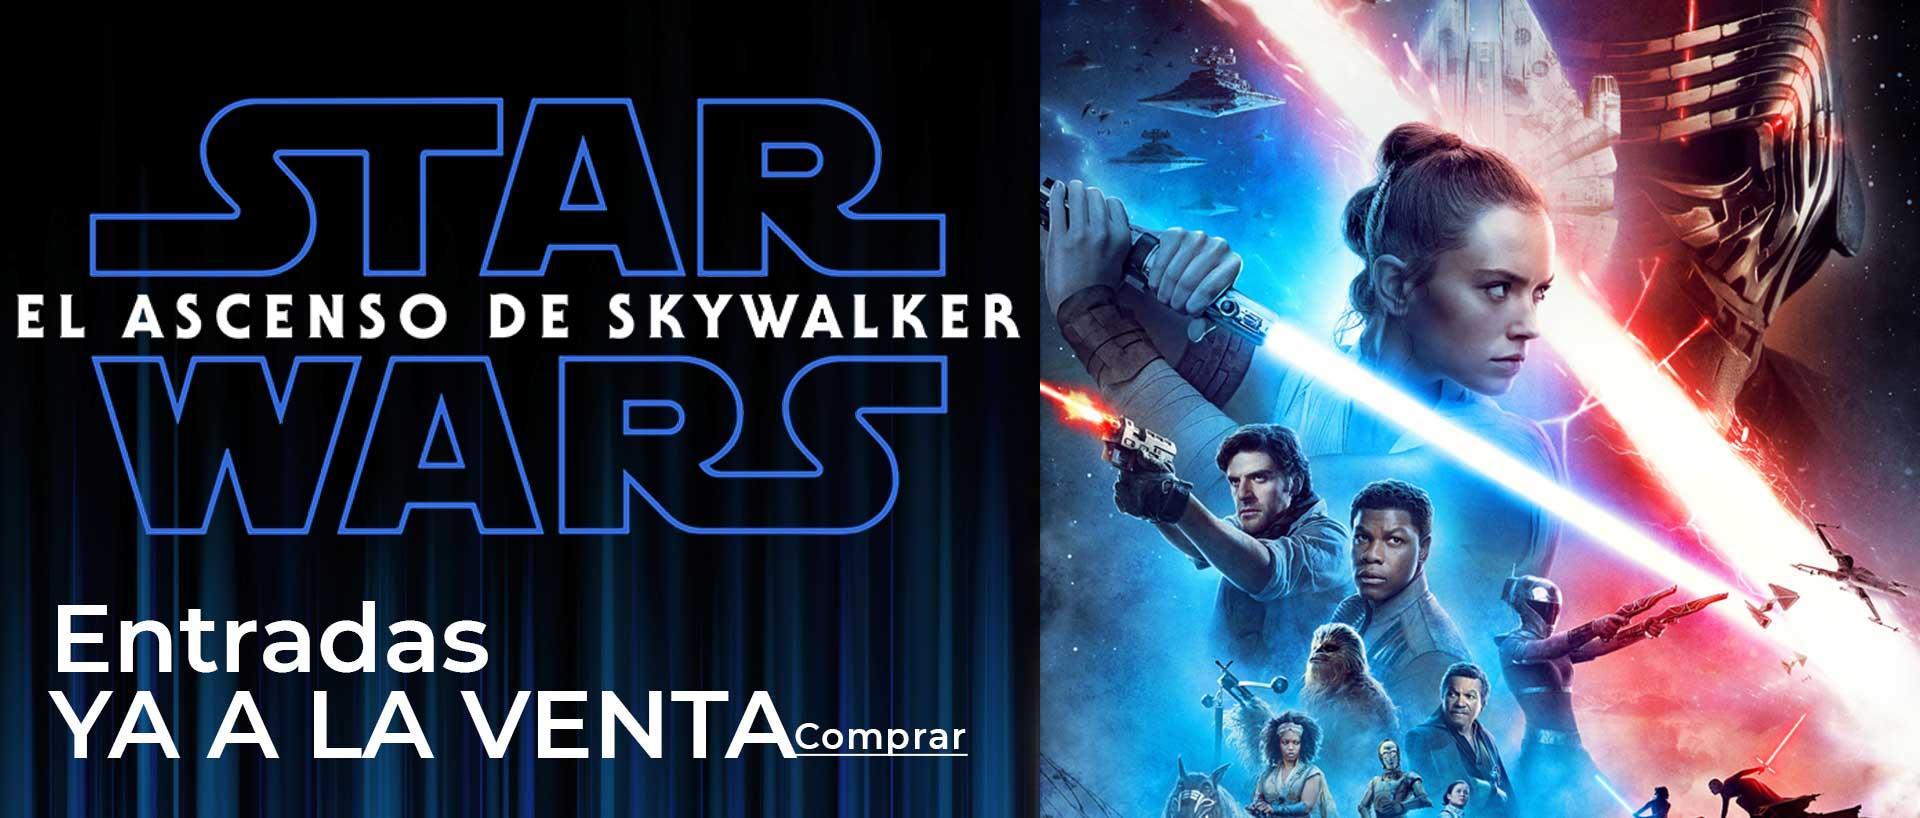 star-wars-banner-web.jpg